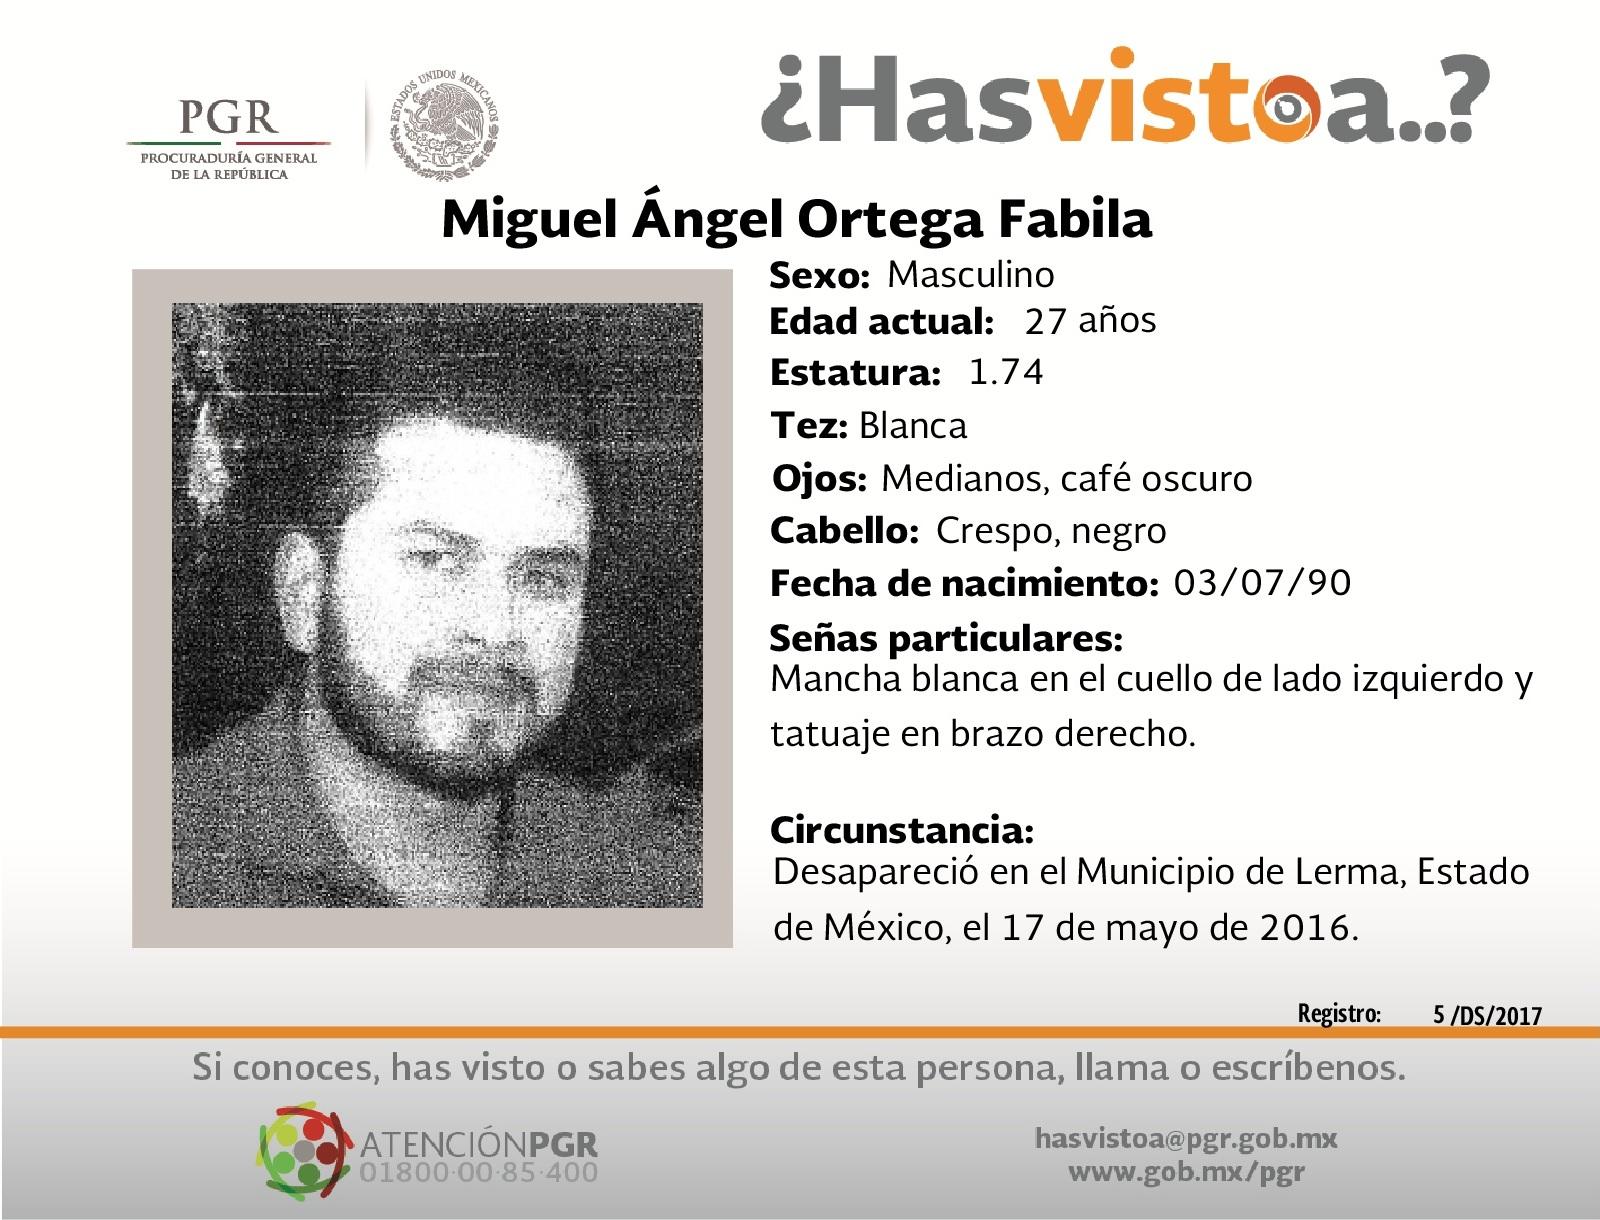 Ayúdanos a localizar a Miguel Ángel Ortega